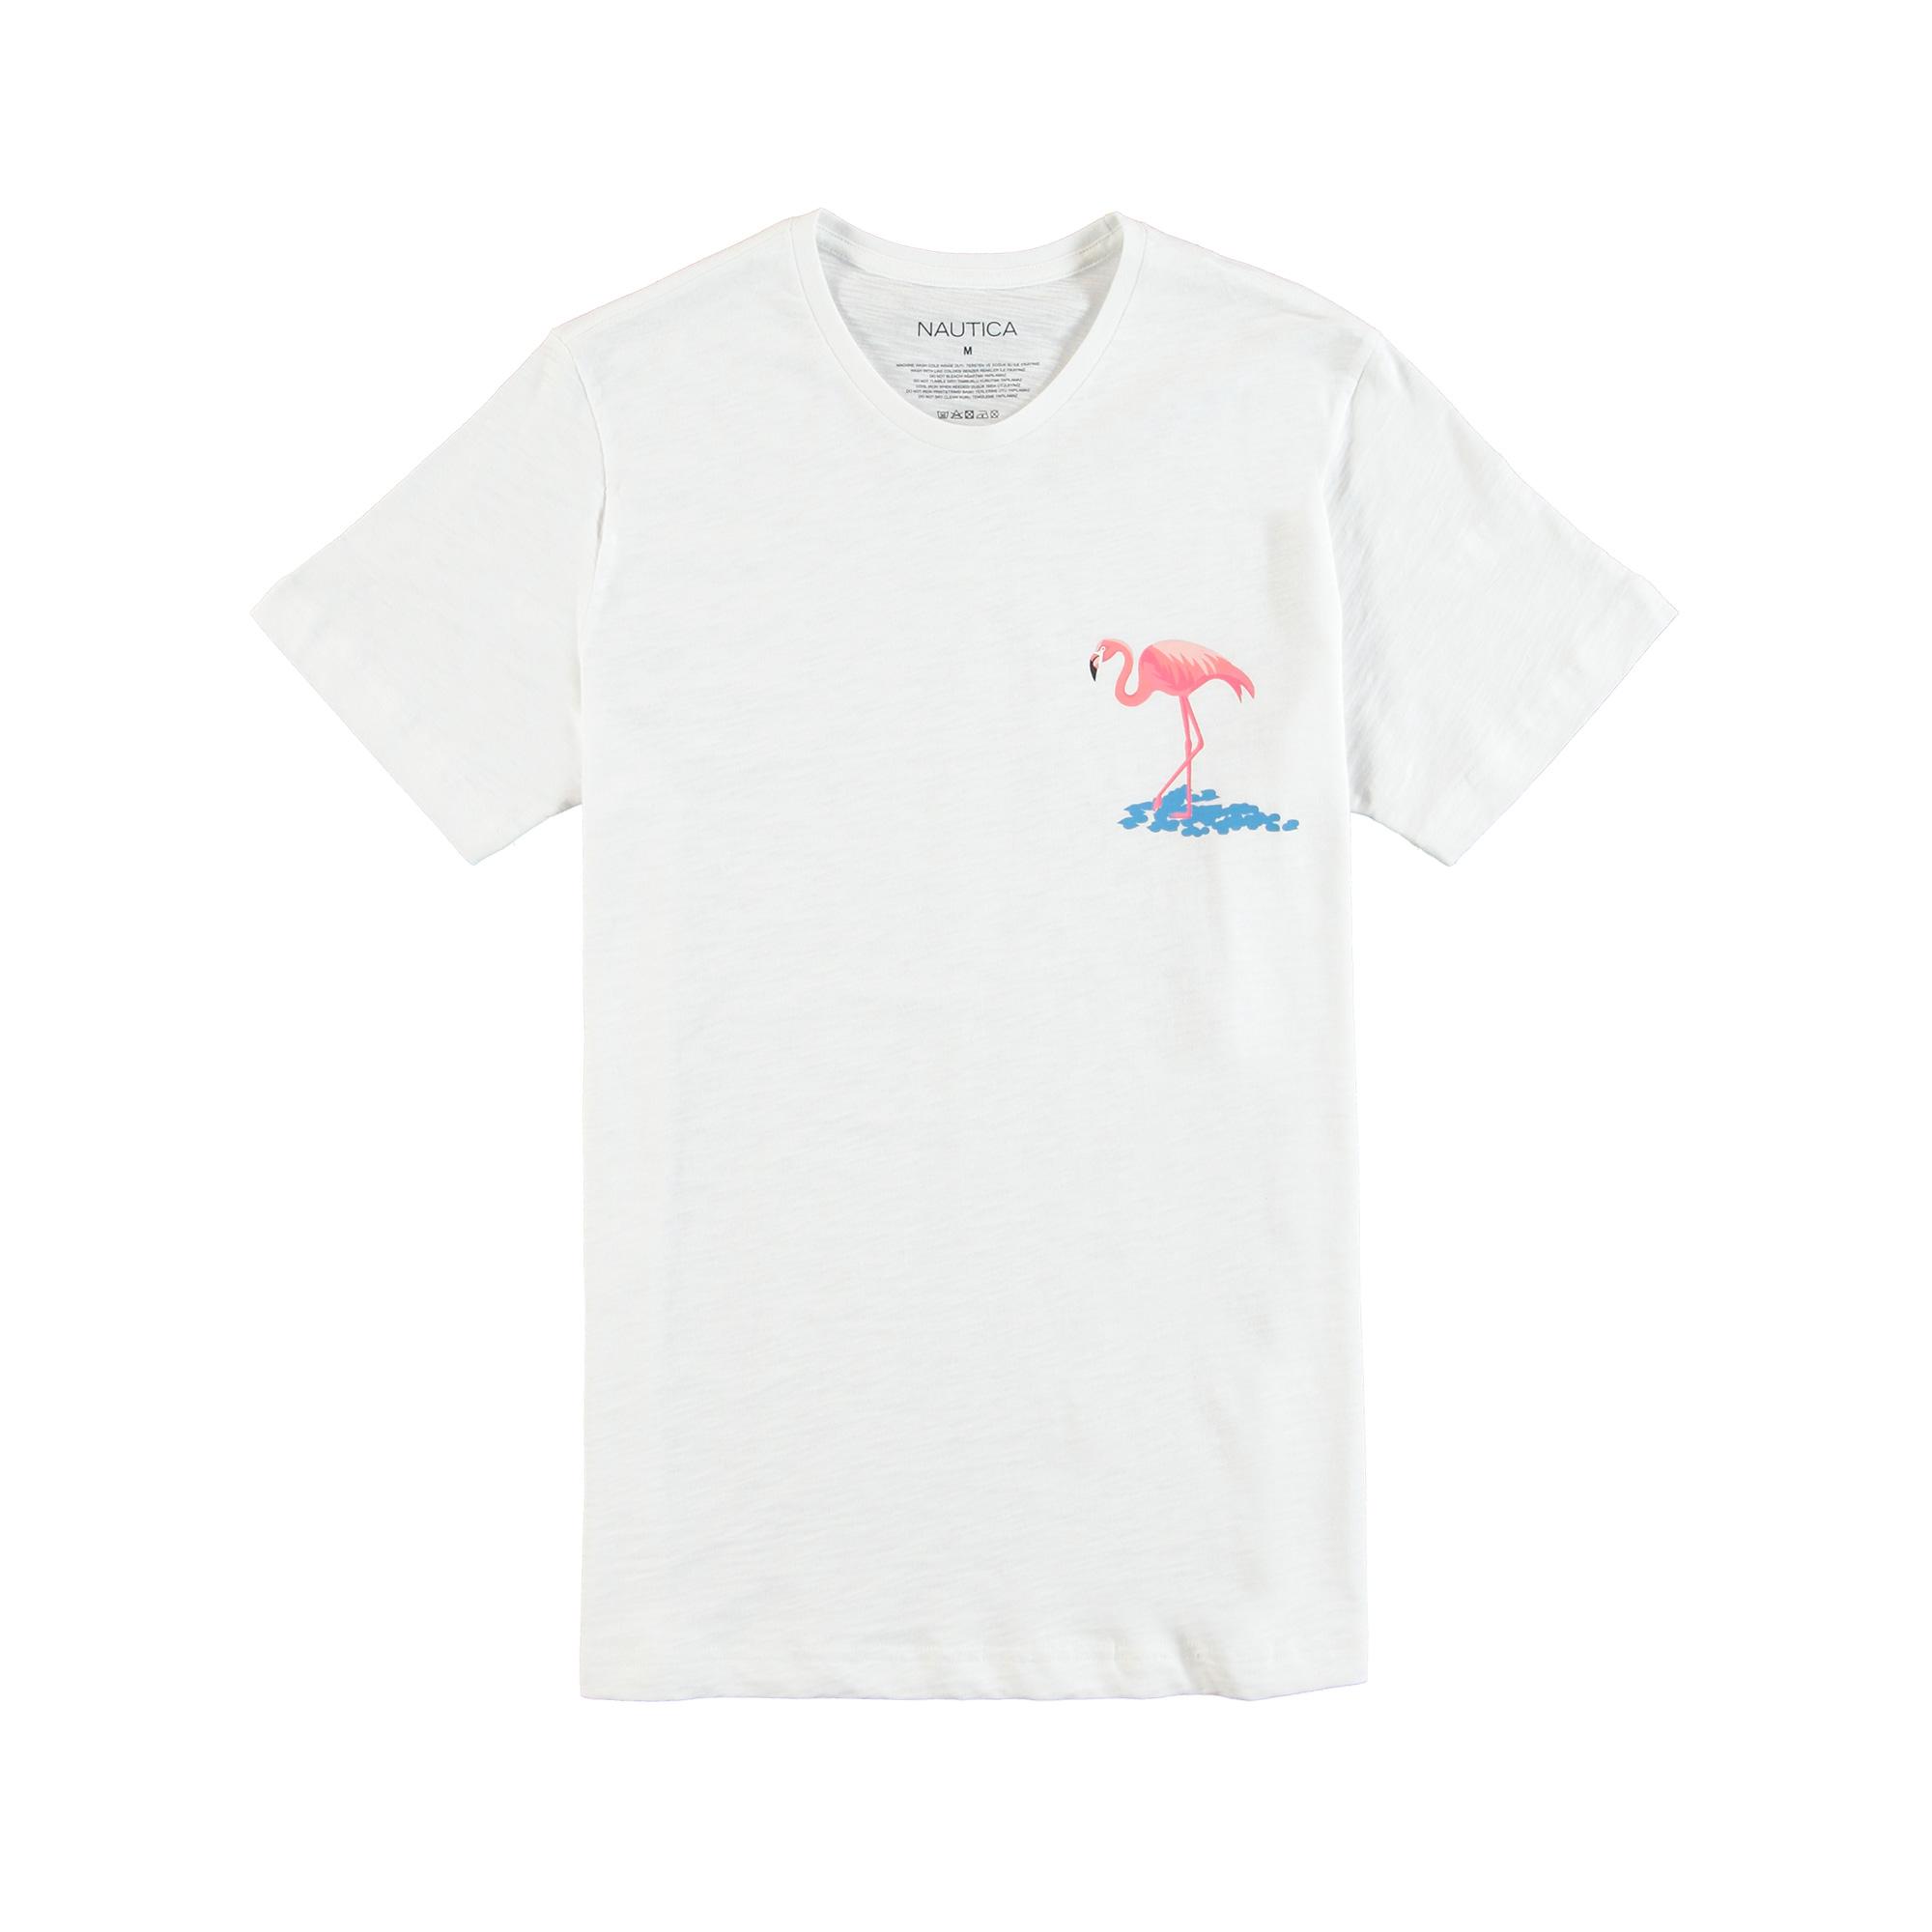 NAUTICA ERKEK Beyaz T-SHIRT